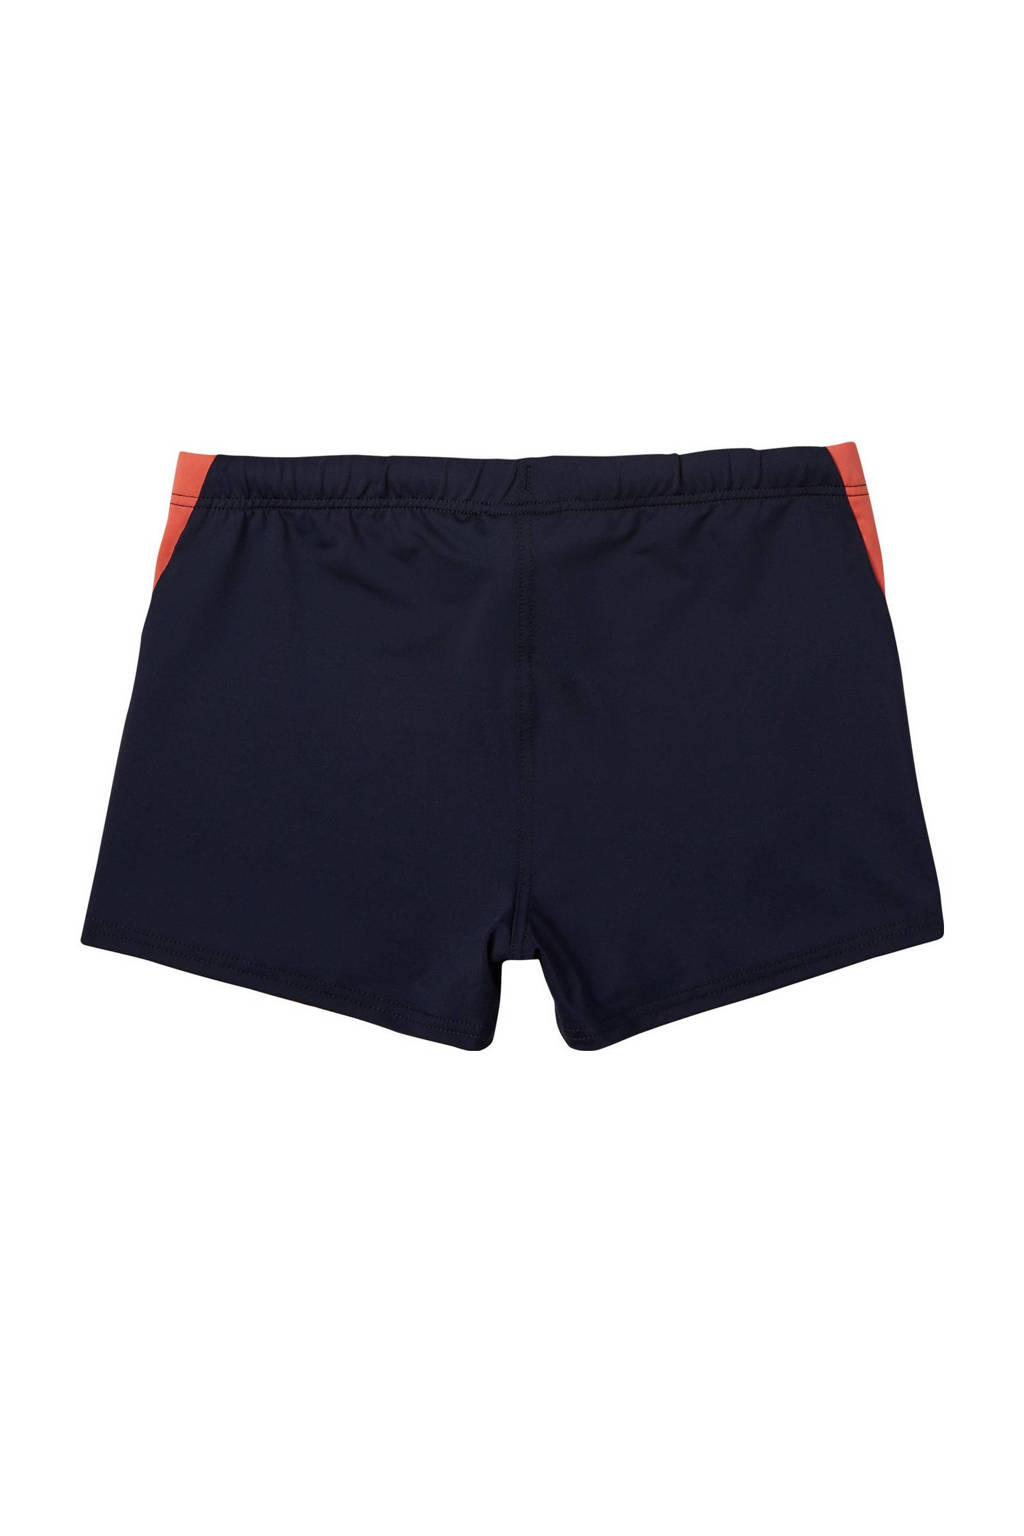 O'Neill zwemboxer Cali donkerblauw/oranje, Donkerblauw/oranje